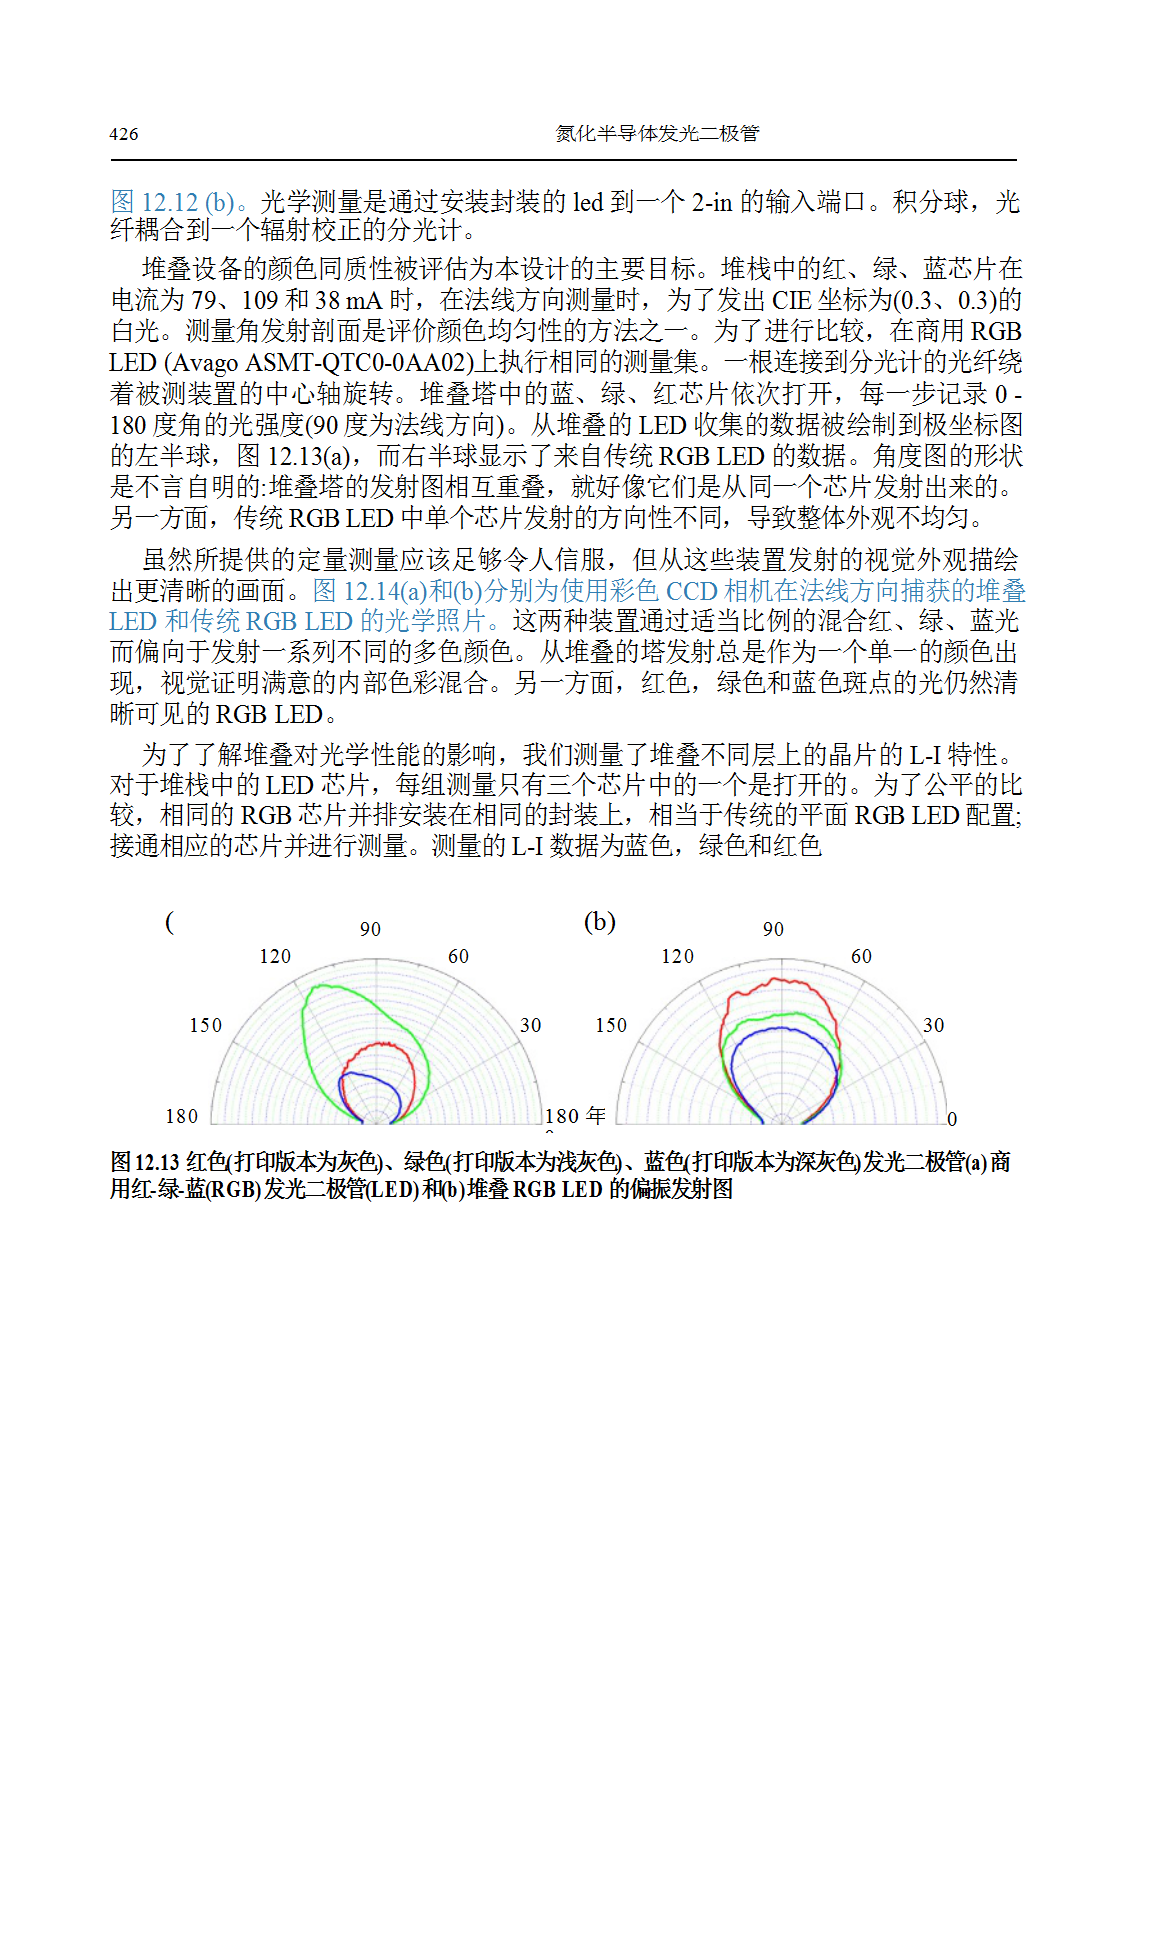 LED调色和像素化MicroLED阵列研究  第12张